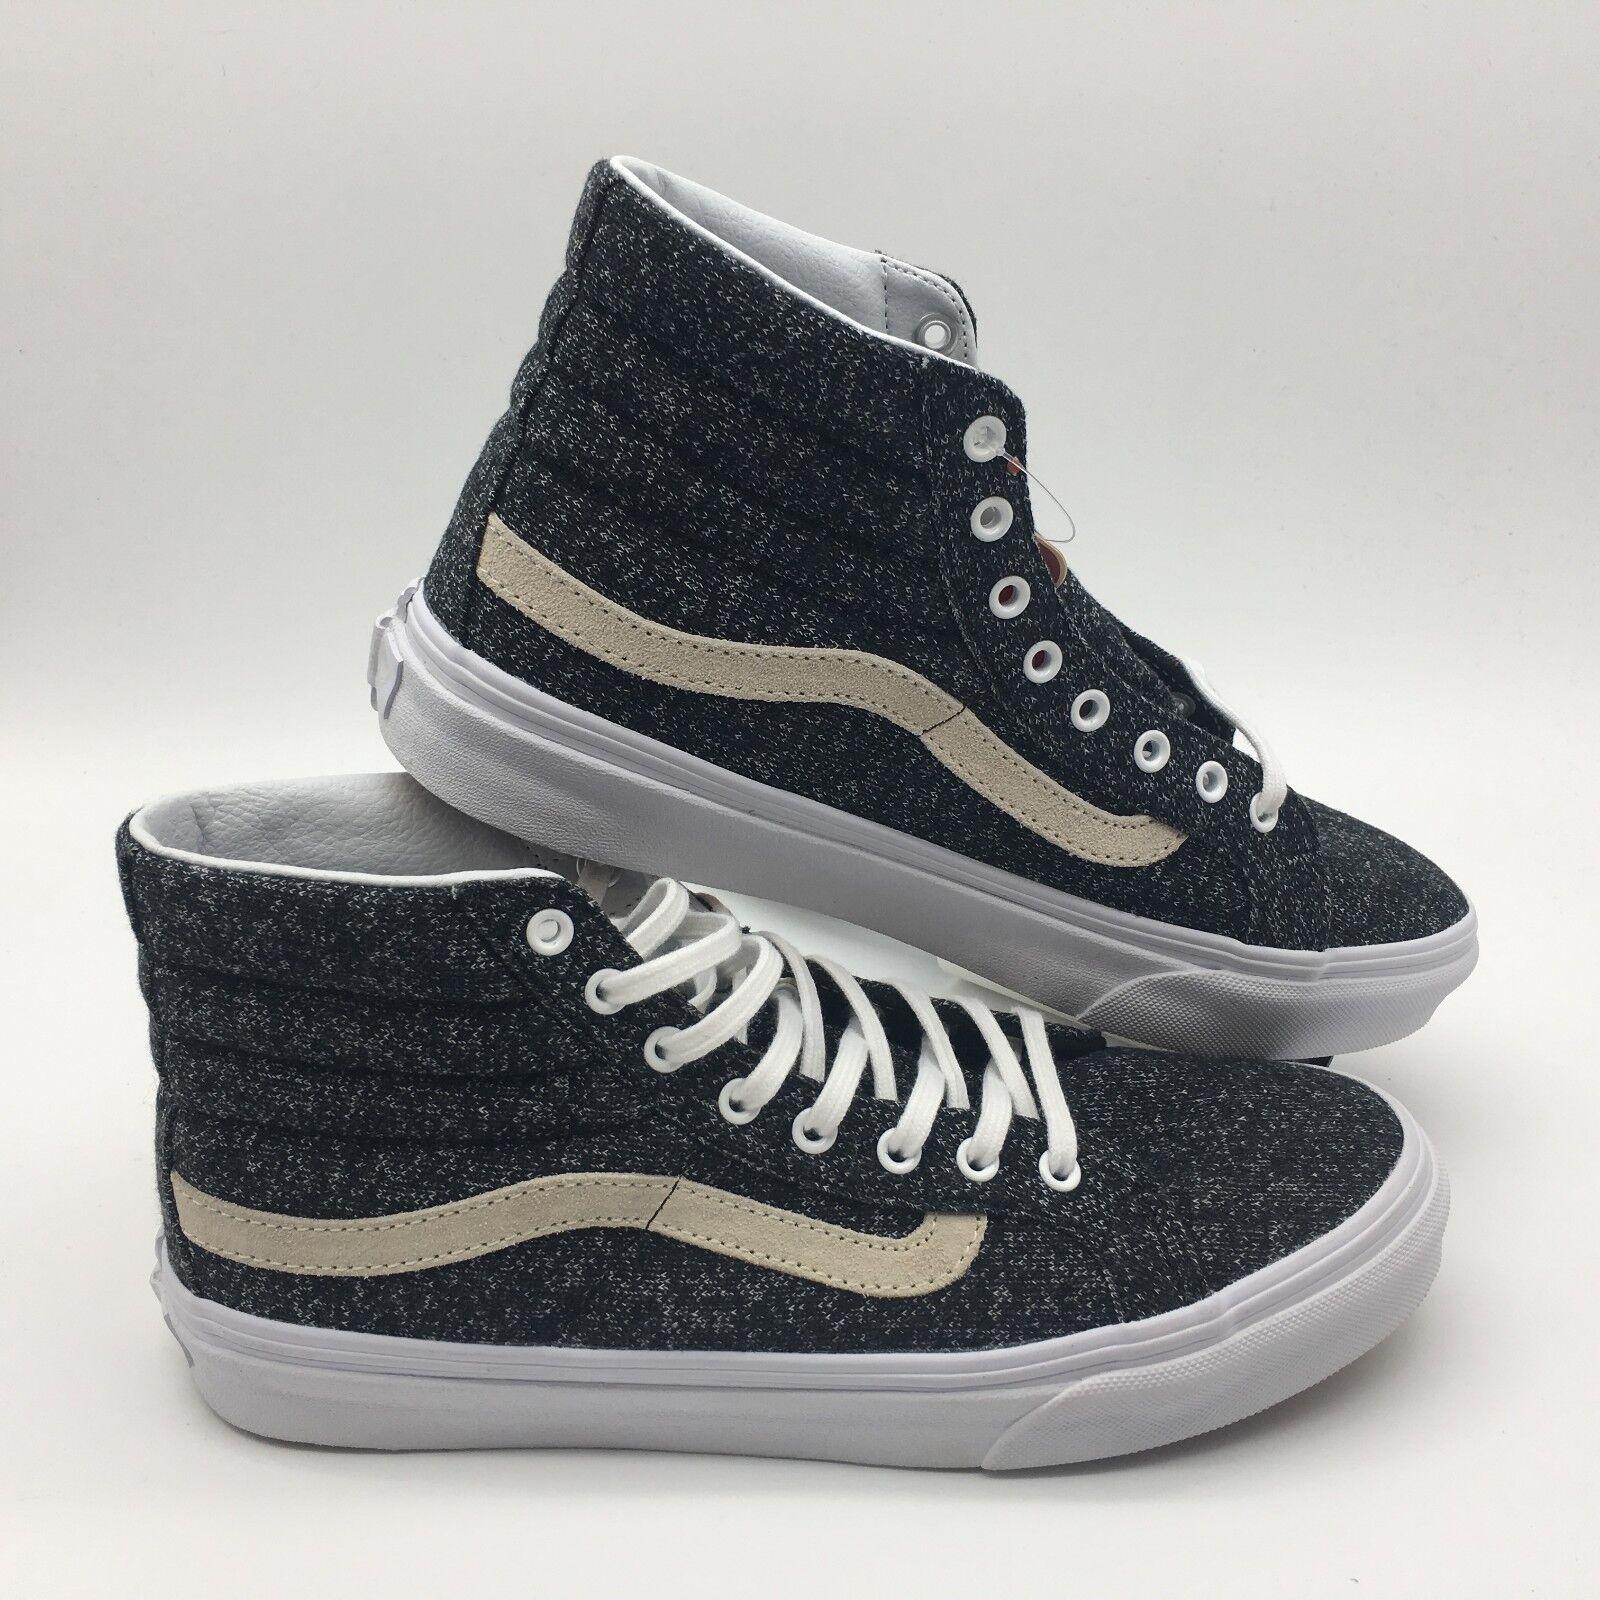 Vans Men's shoes  Sk8-Hi Slim  (J&s) Black True White